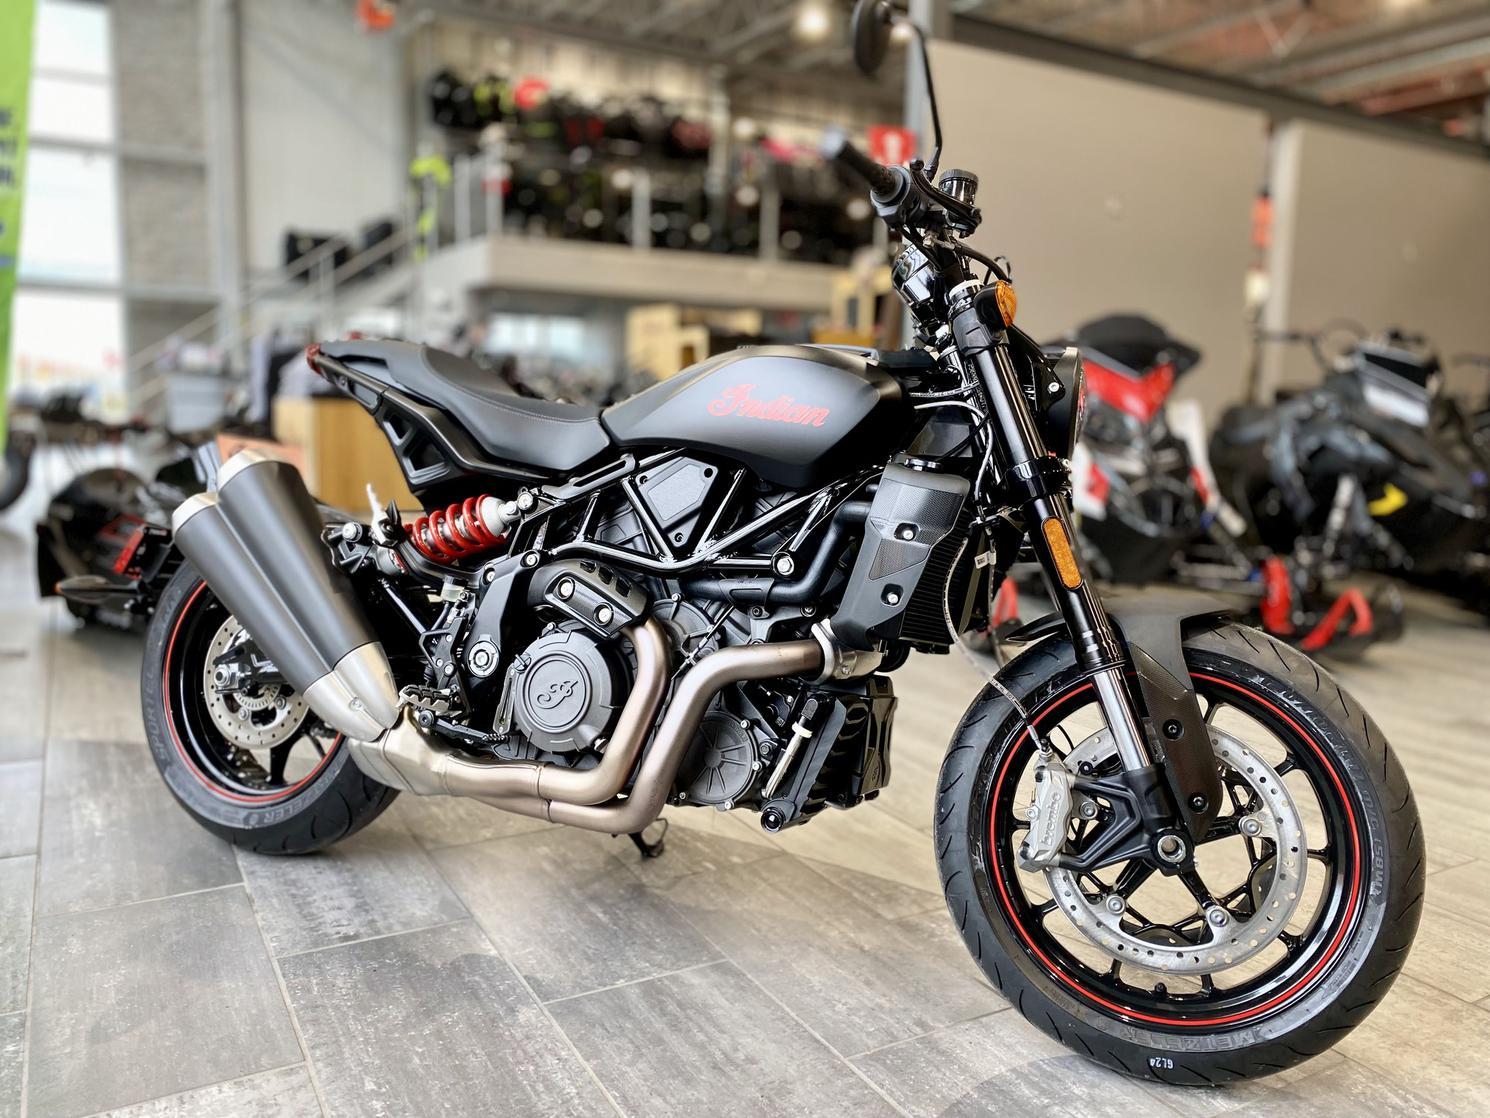 Indian Motorcycle FTR 1200 2022